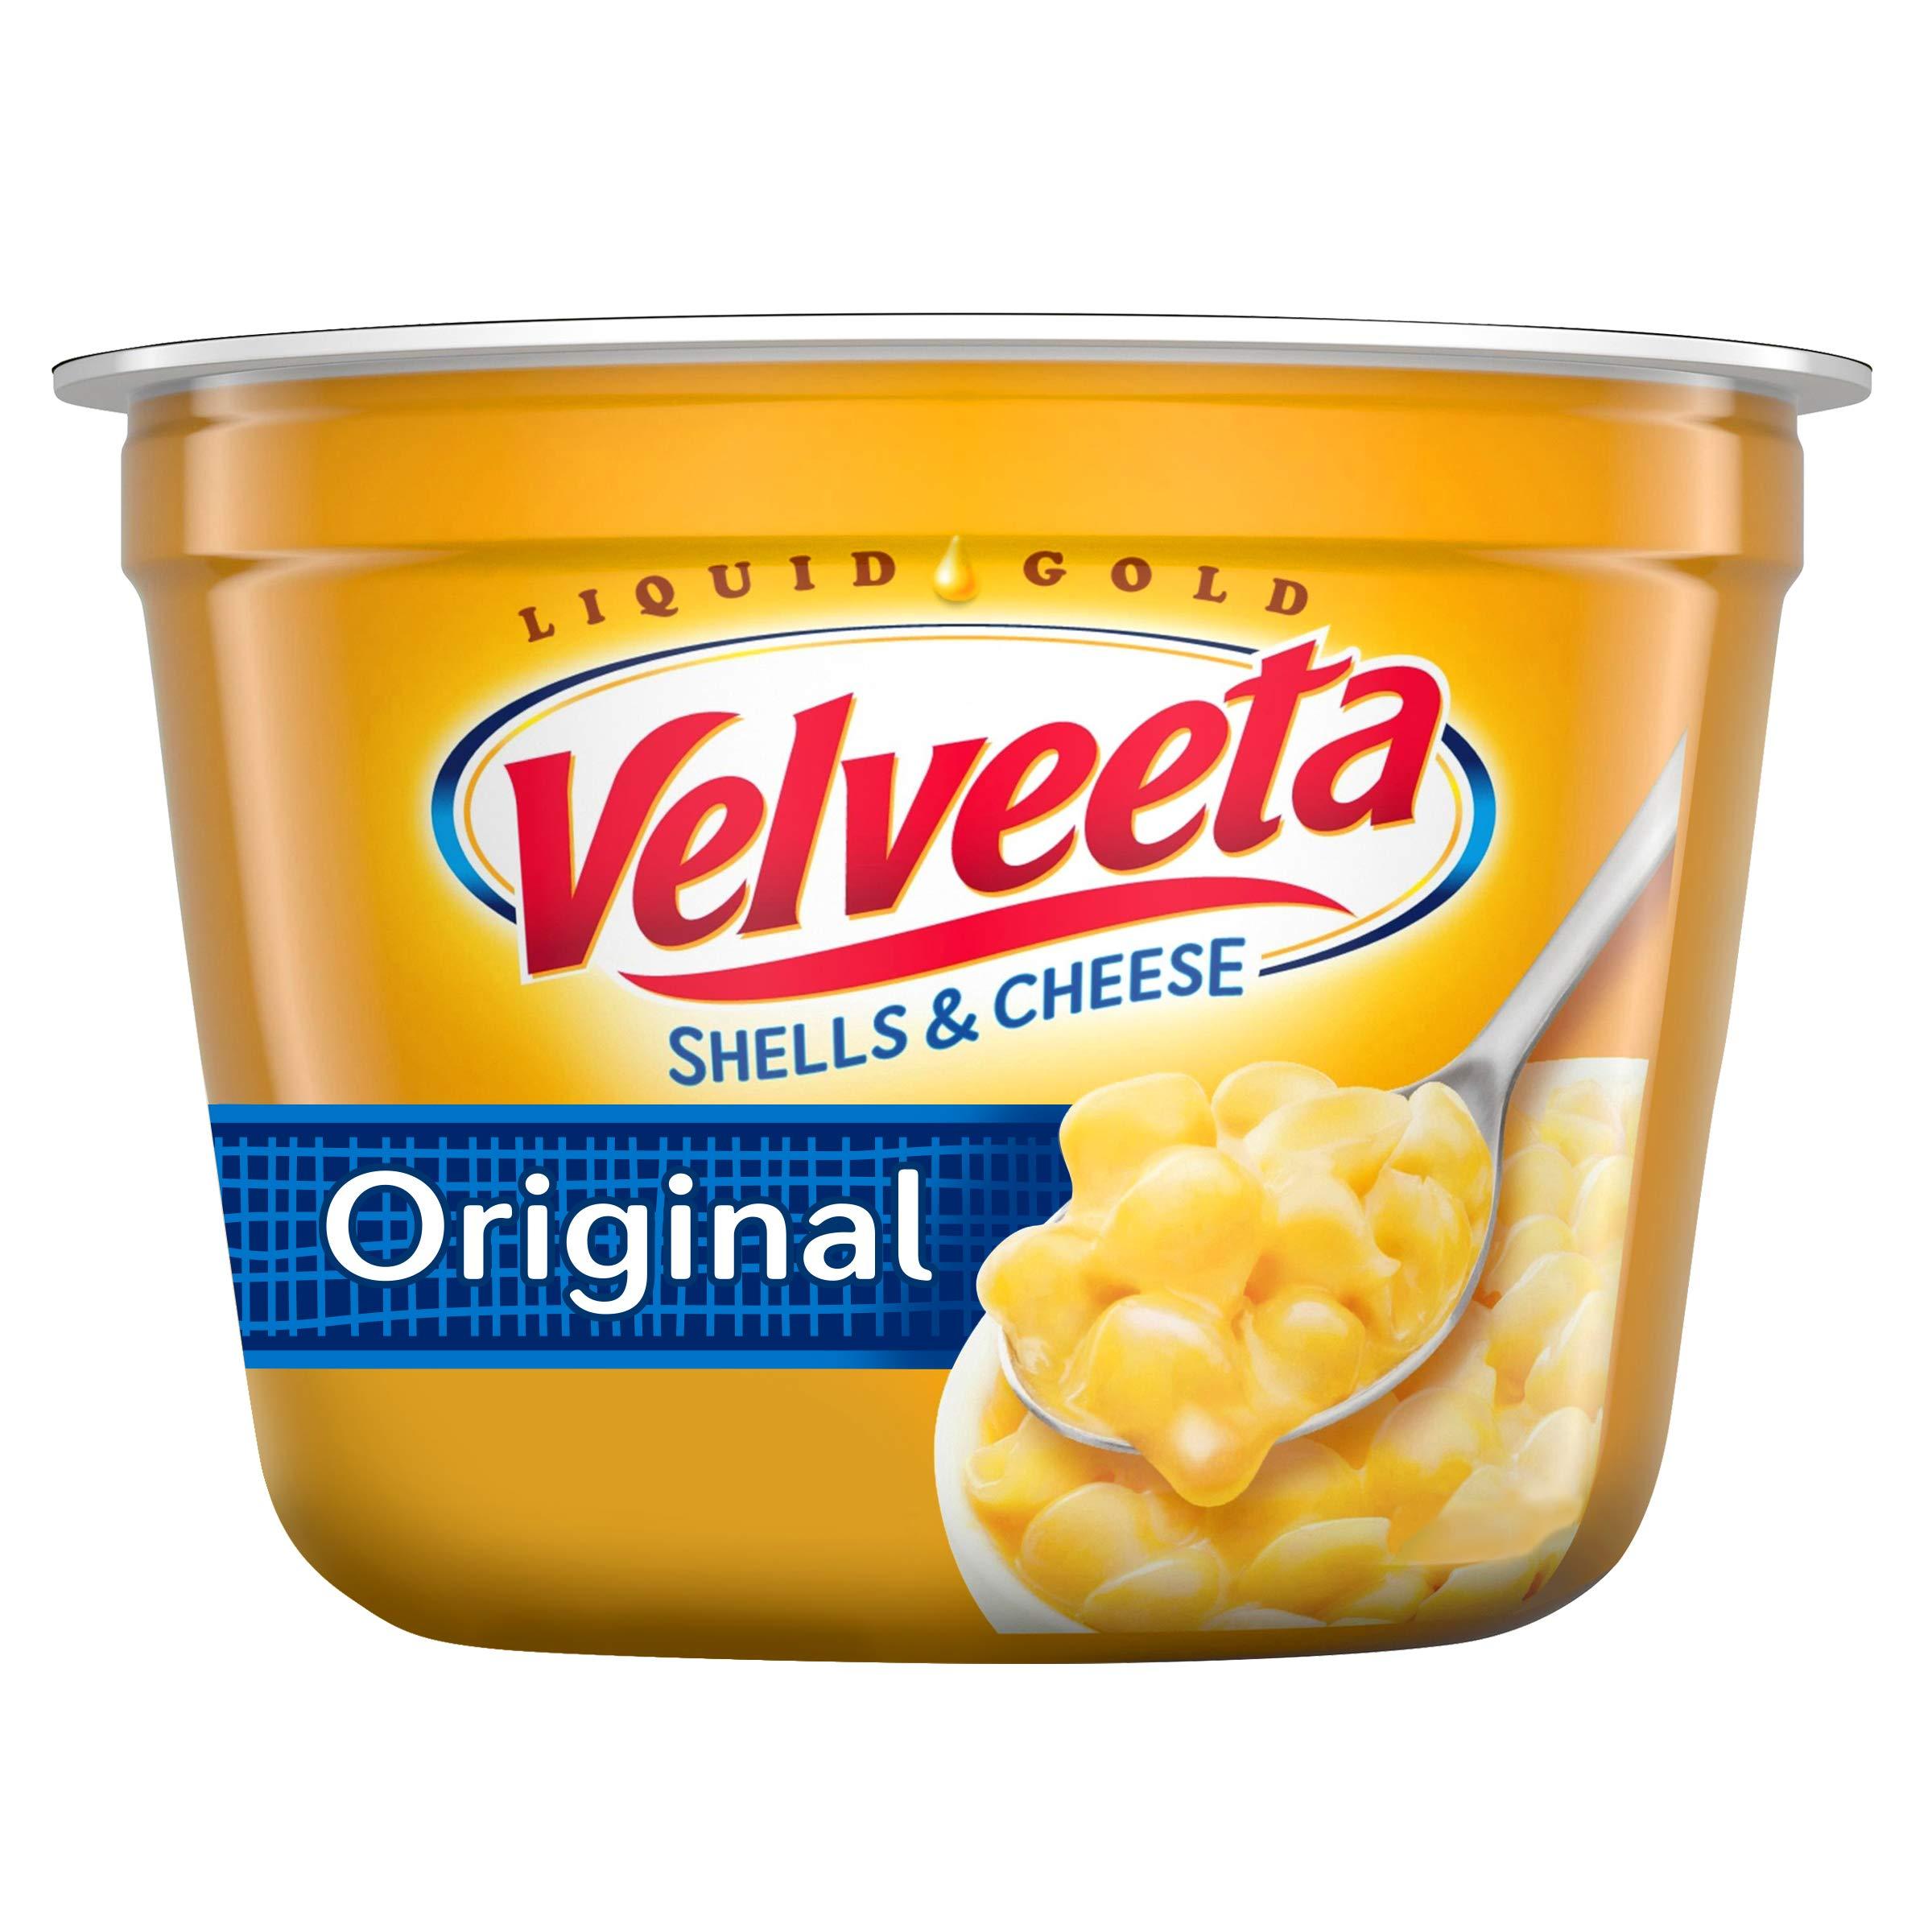 Velveeta Original Easy Mac Shells and Cheese (2.39 oz Microwaveable Cup)